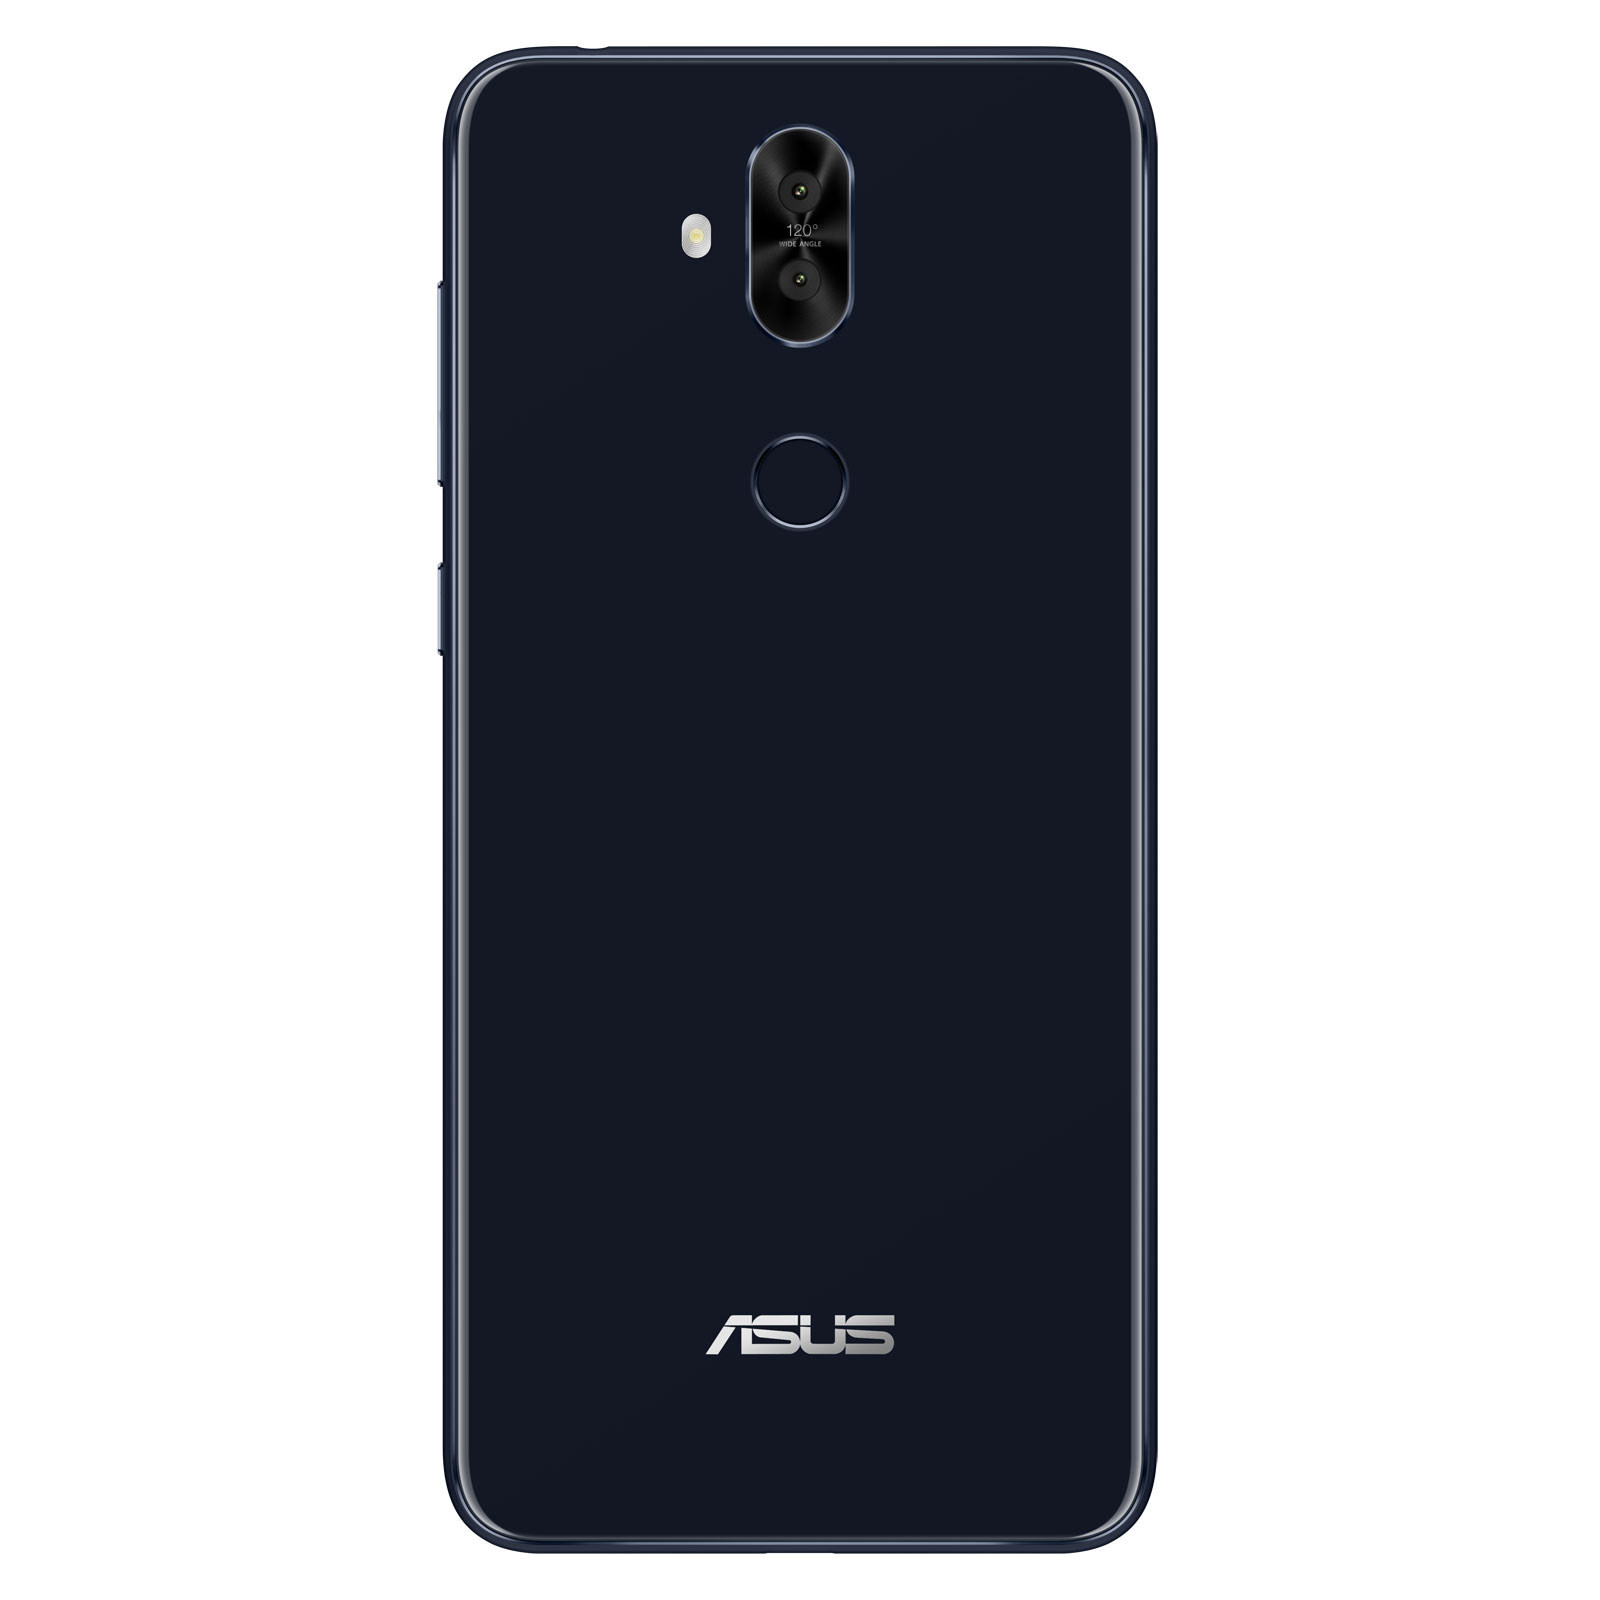 Asus Zenfone 5 Lite Meilleurs Prix